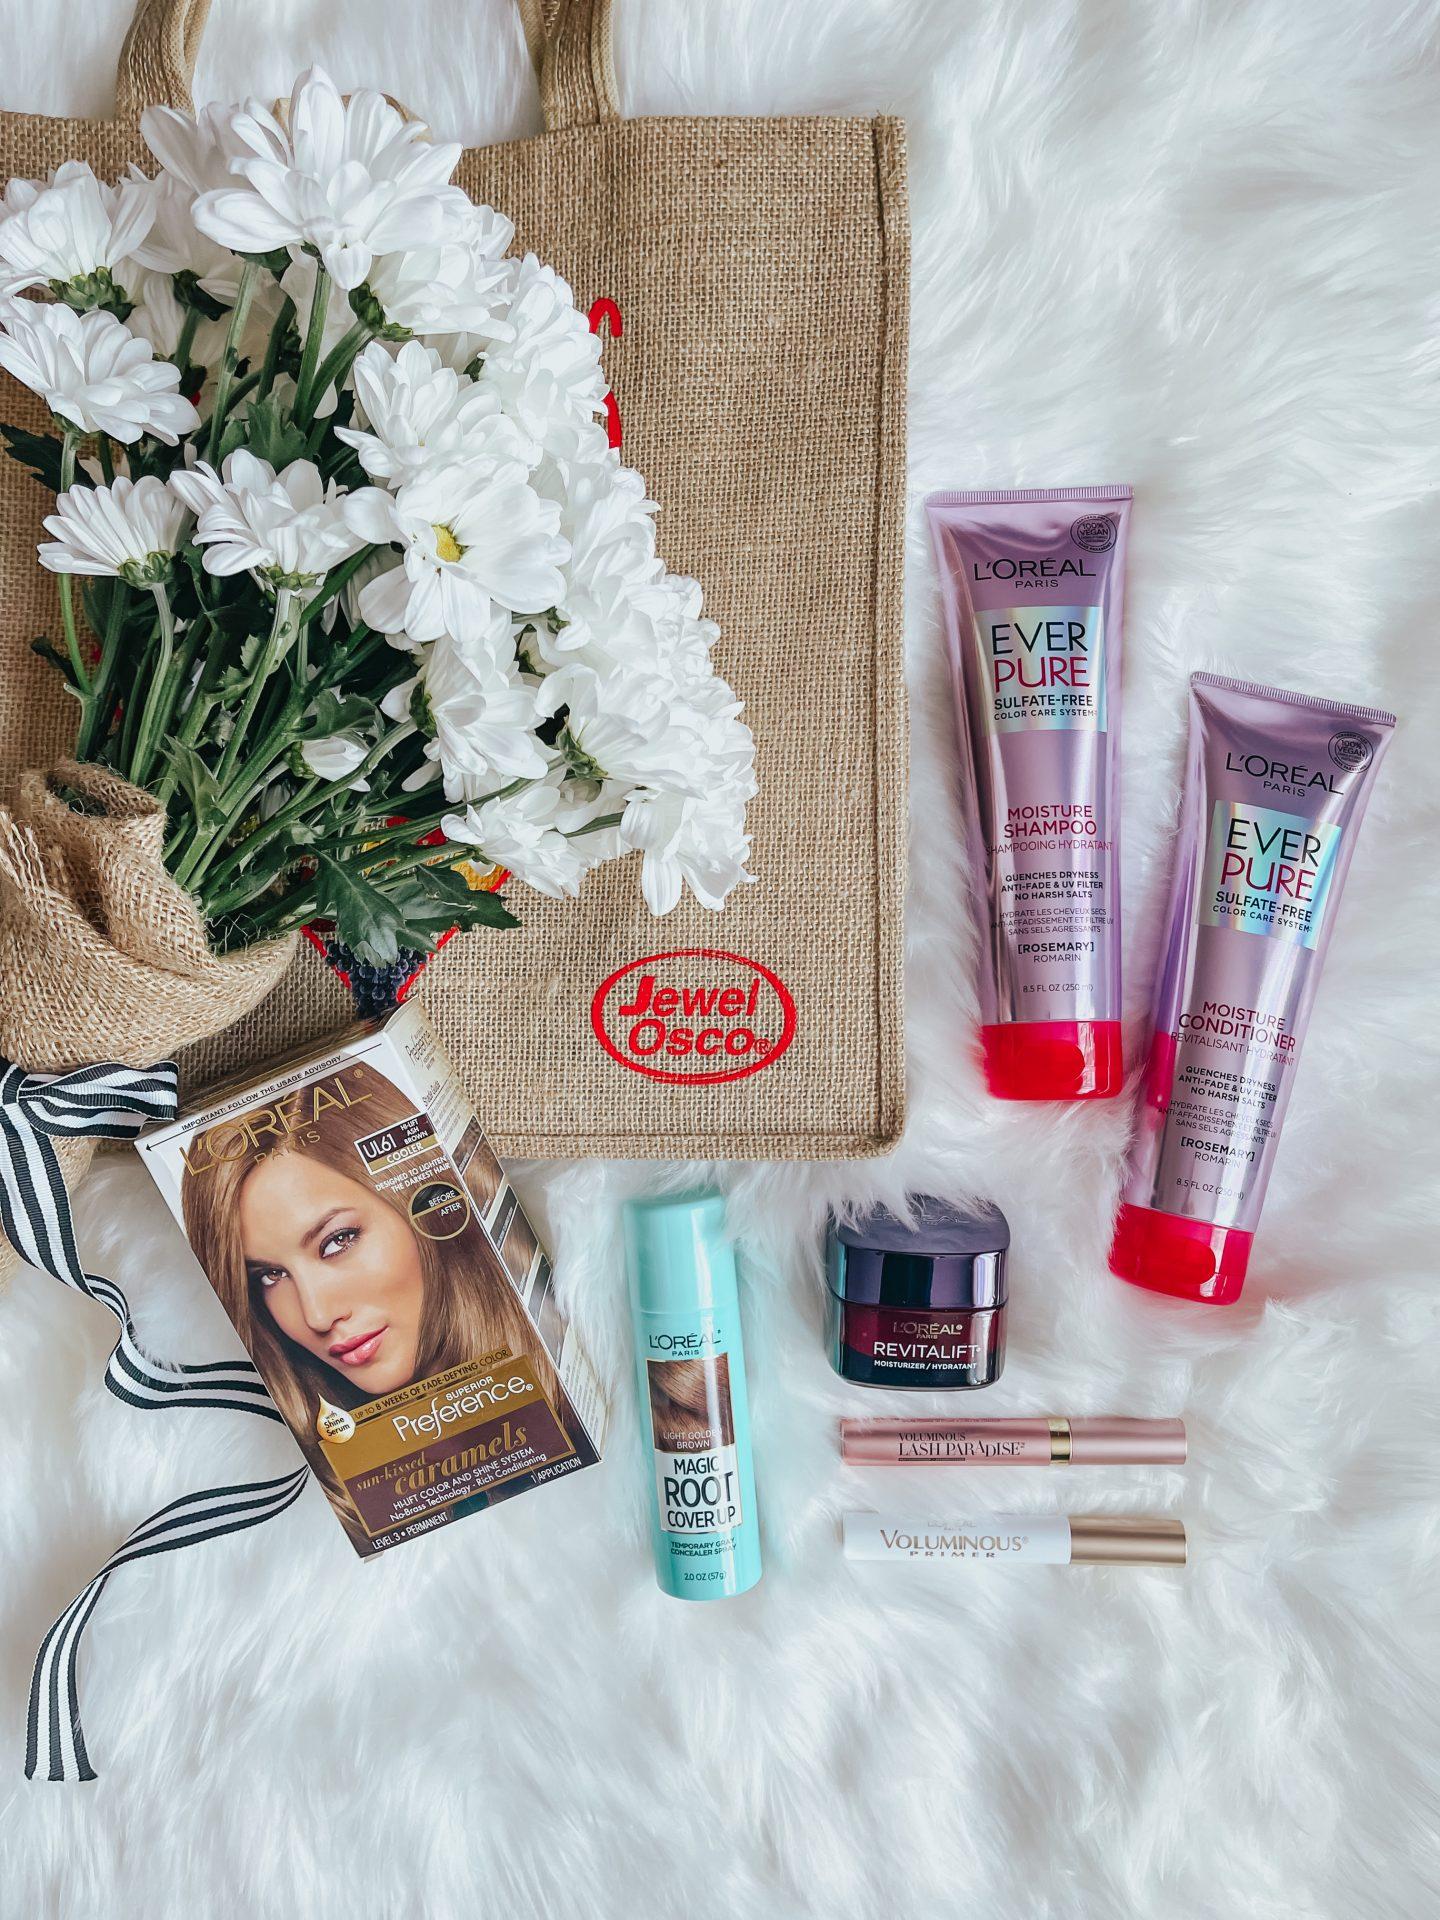 Beauty favorites from Jewel Osco